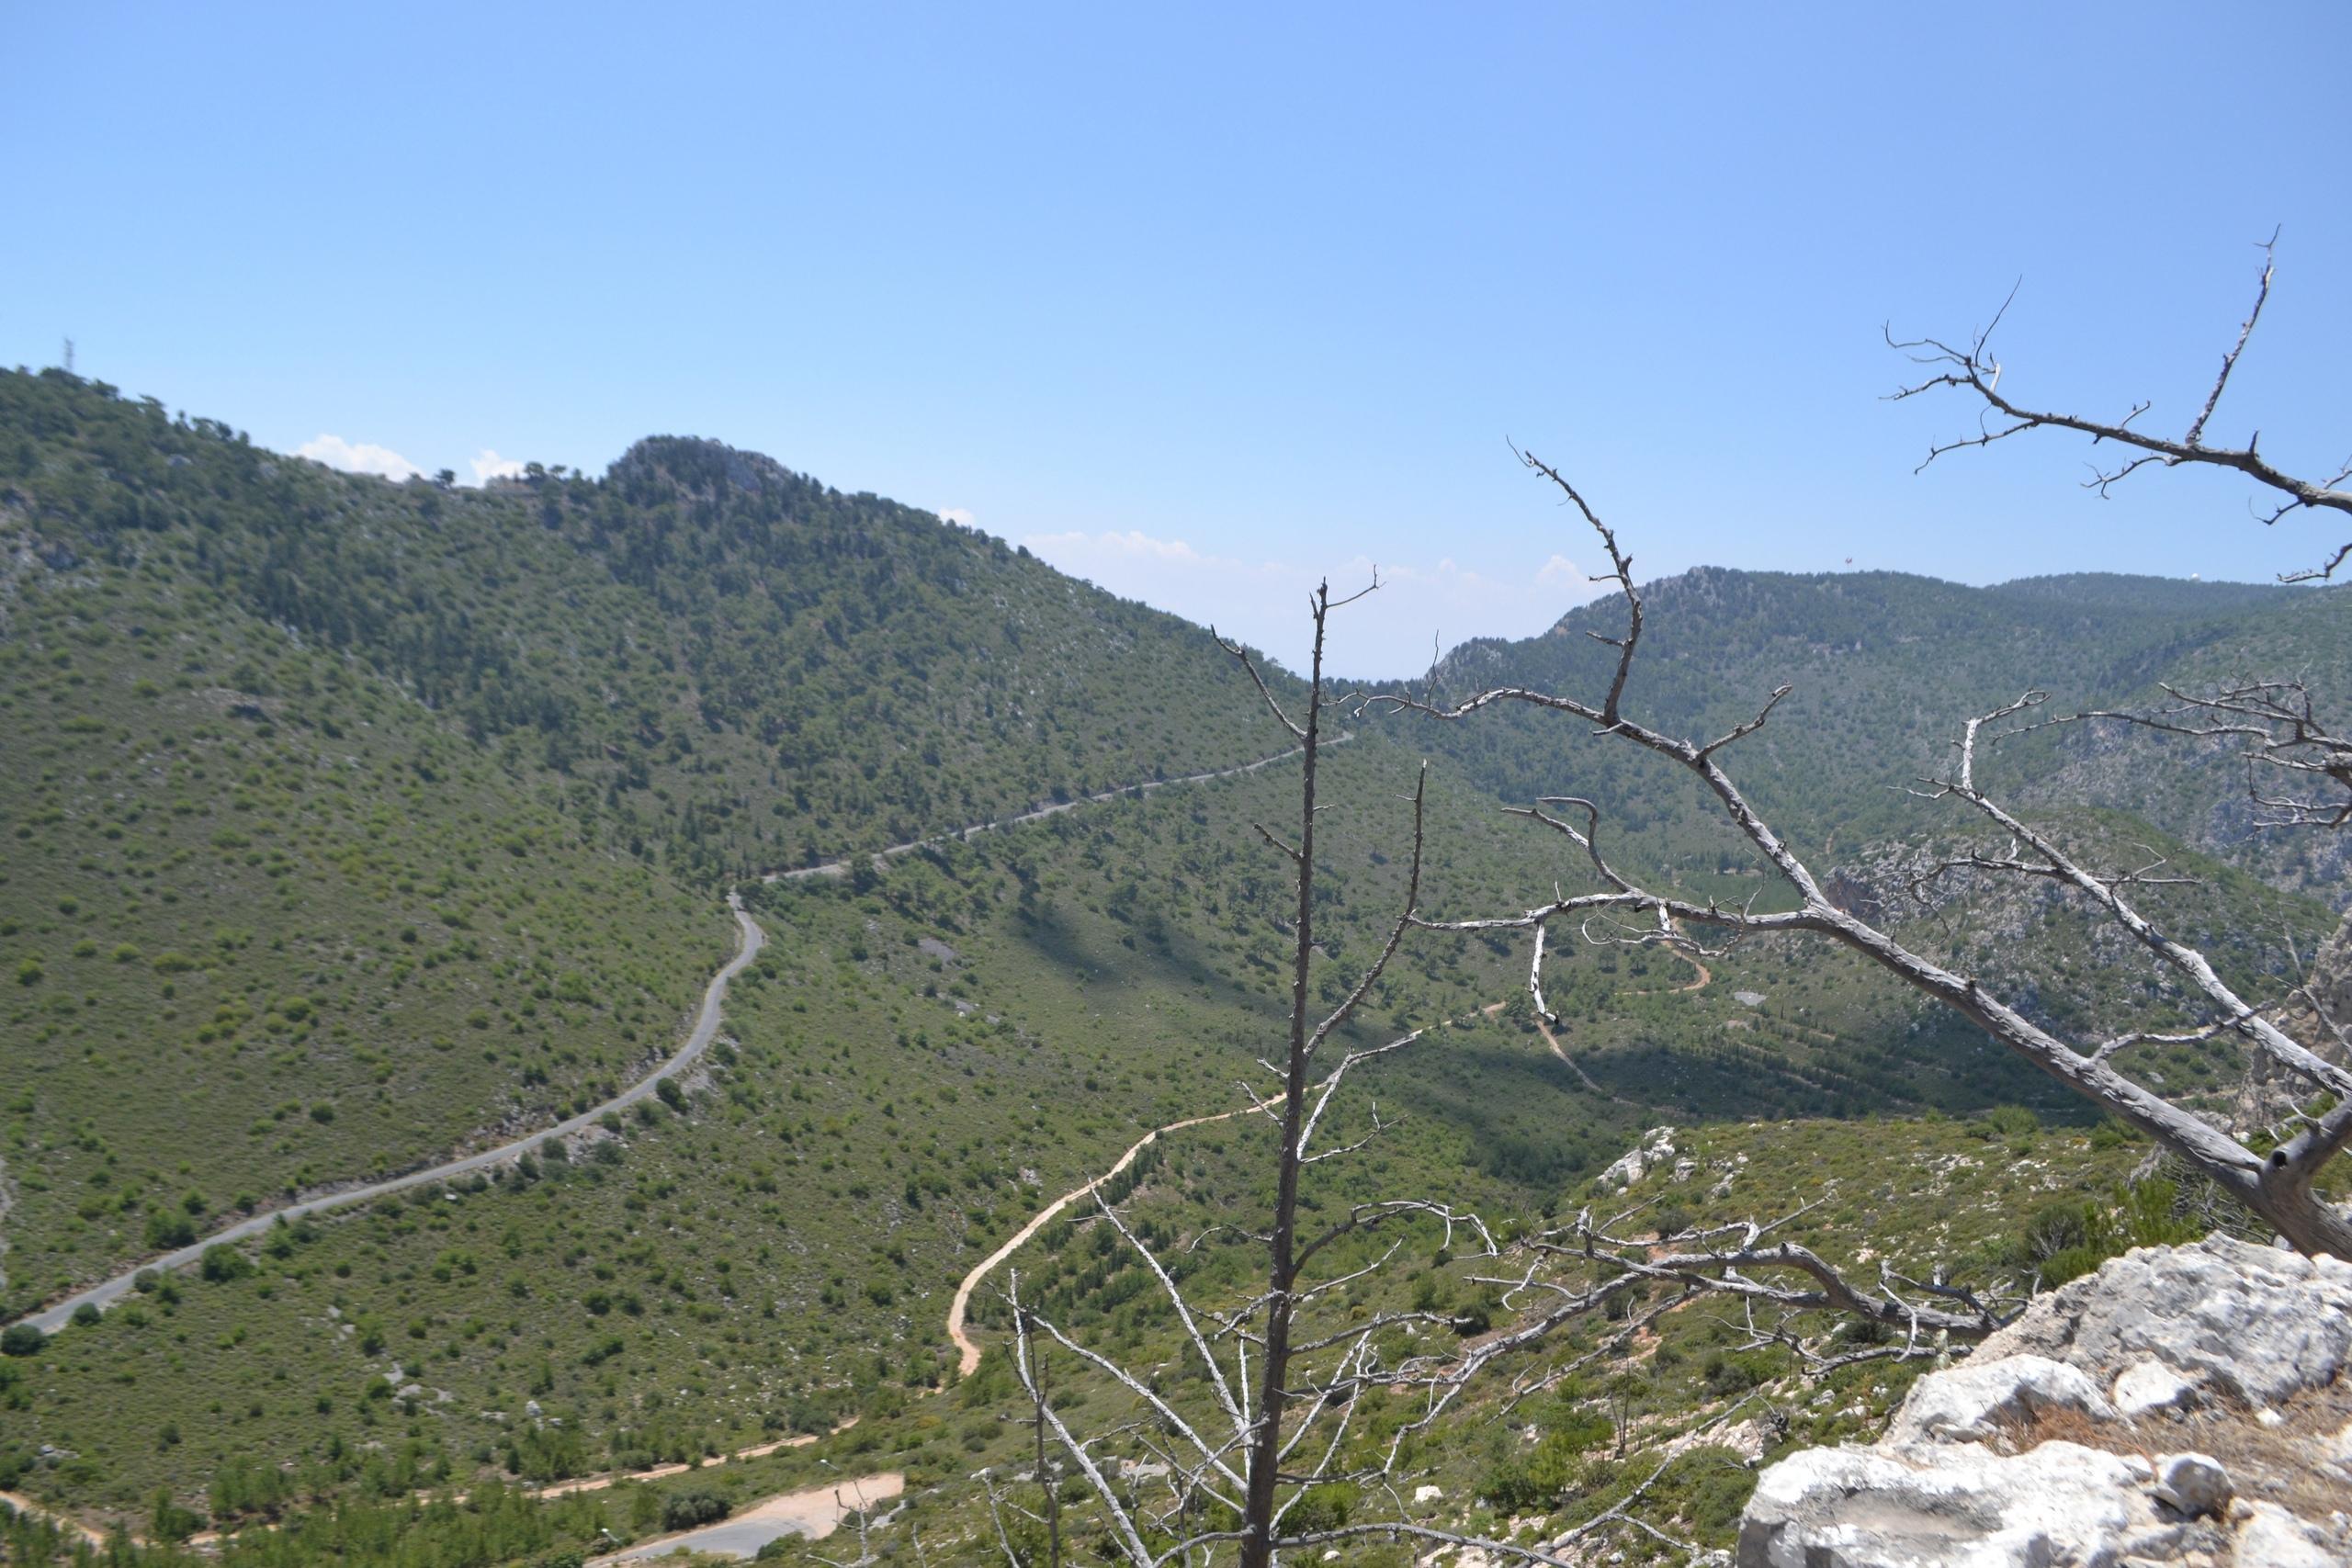 Северный Кипр. Замок Святого Иллариона. (фото). - Страница 3 A1HJfbGkjlg